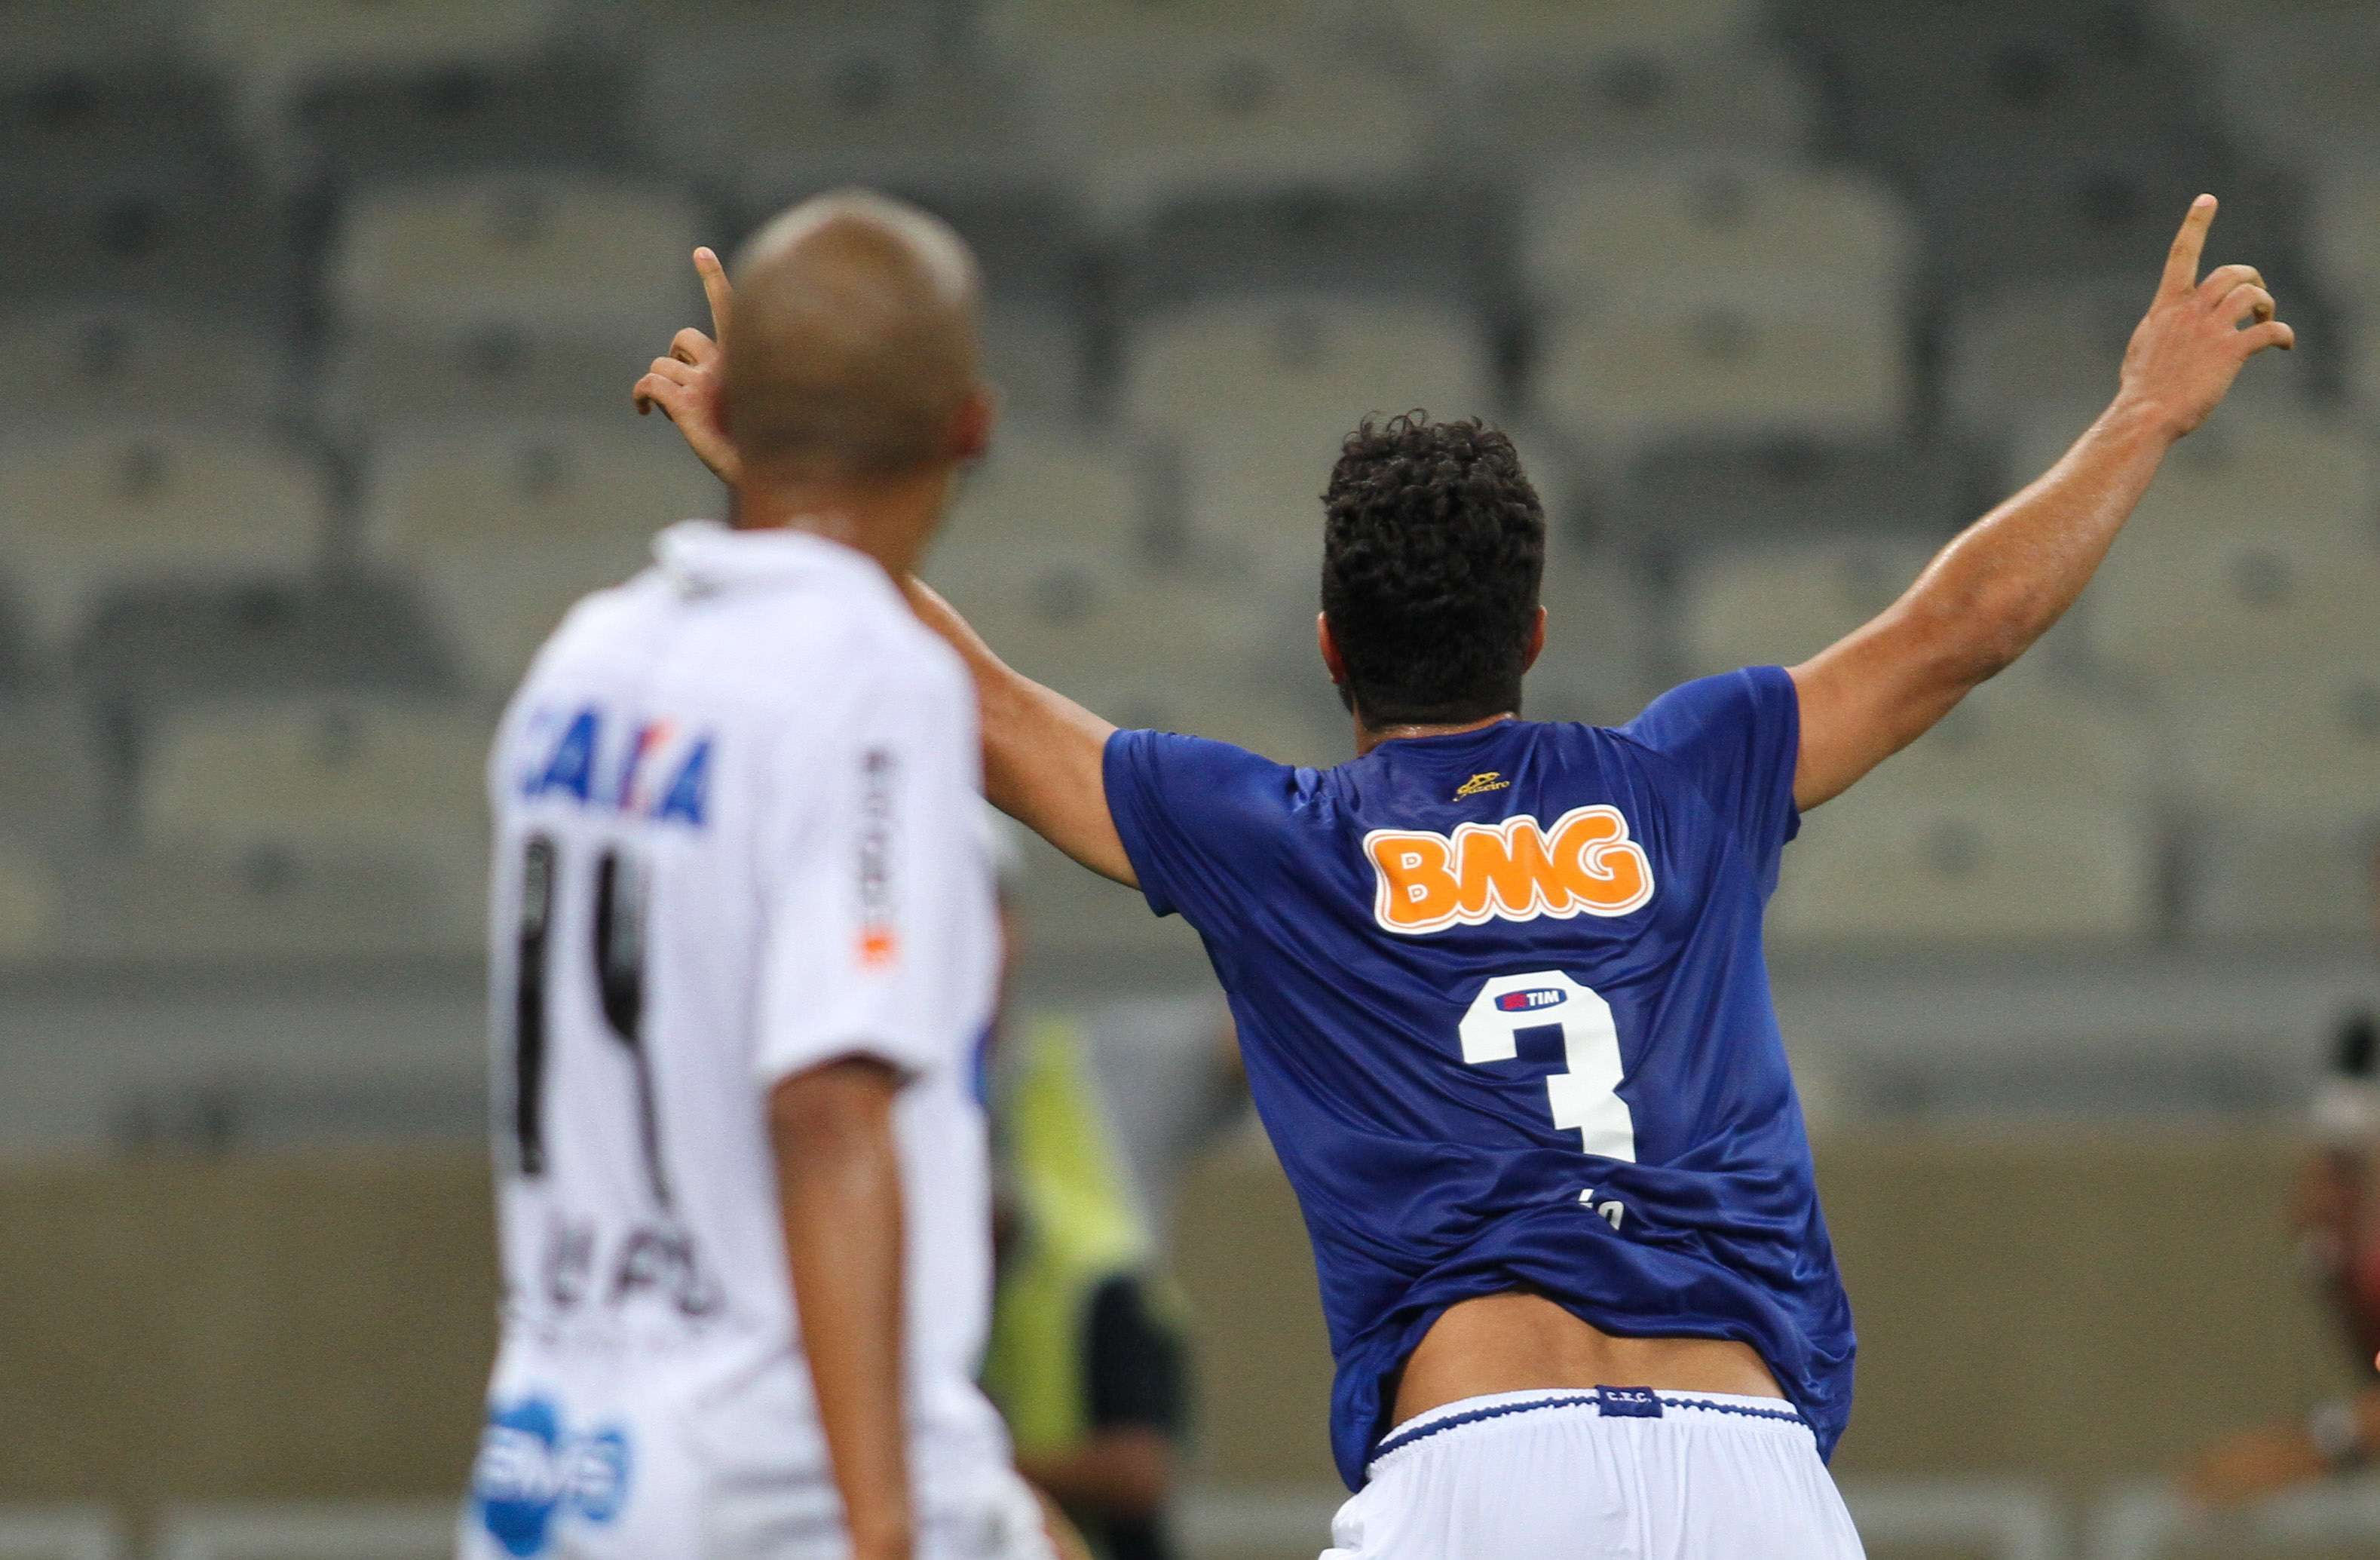 Léo fez o gol da vitória do Cruzeiro Foto: Gil Leonardi/Agência Lance